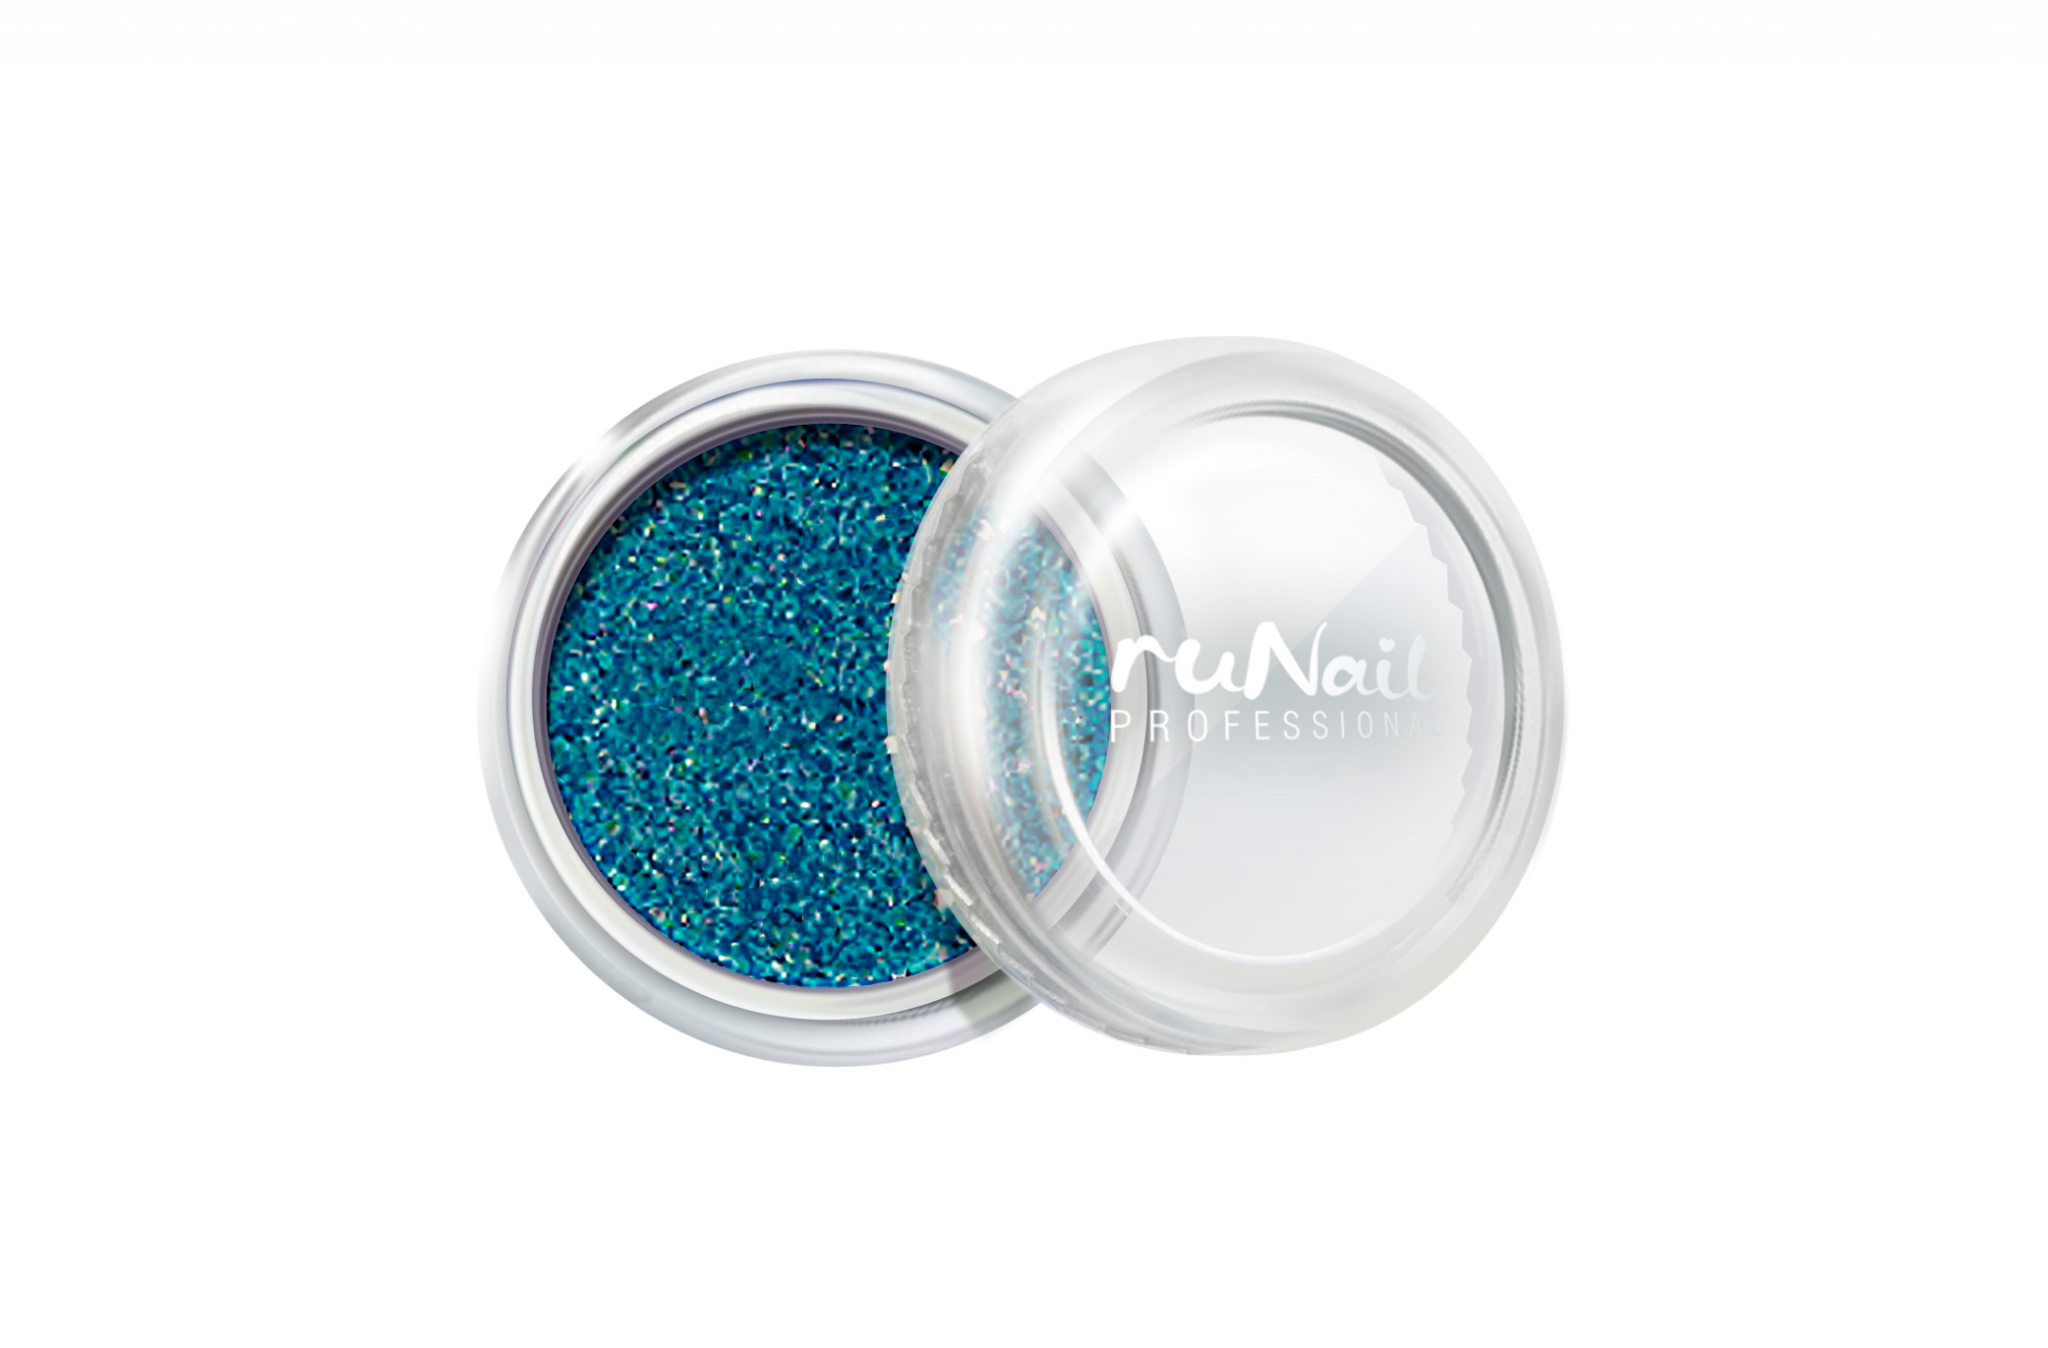 Дизайн для ногтей: зеркальная пыль №4300